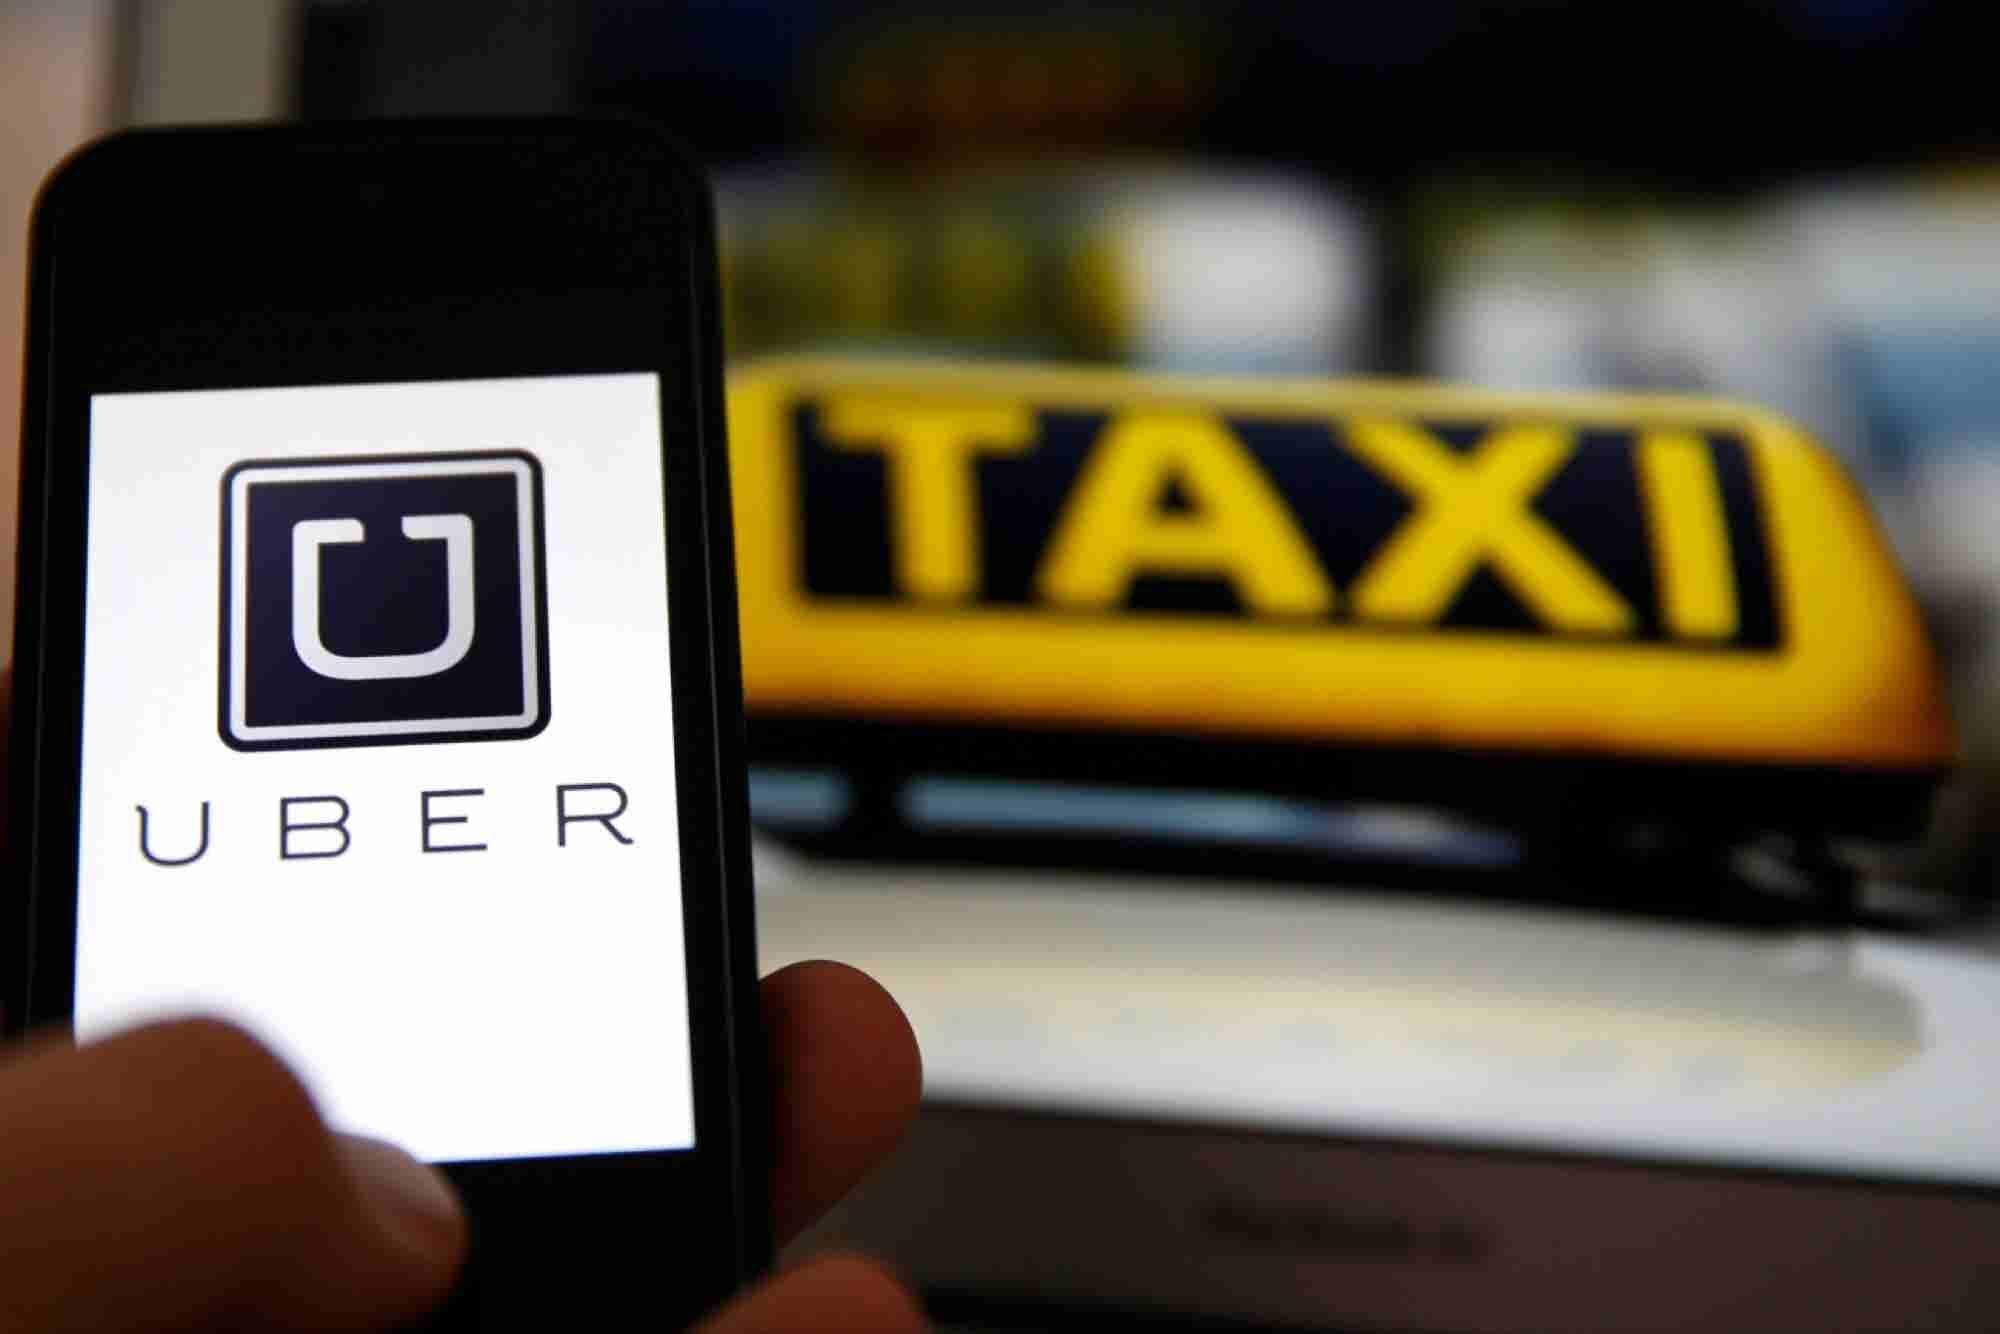 Uber in Talks With Banks for $1 Billion Credit Line